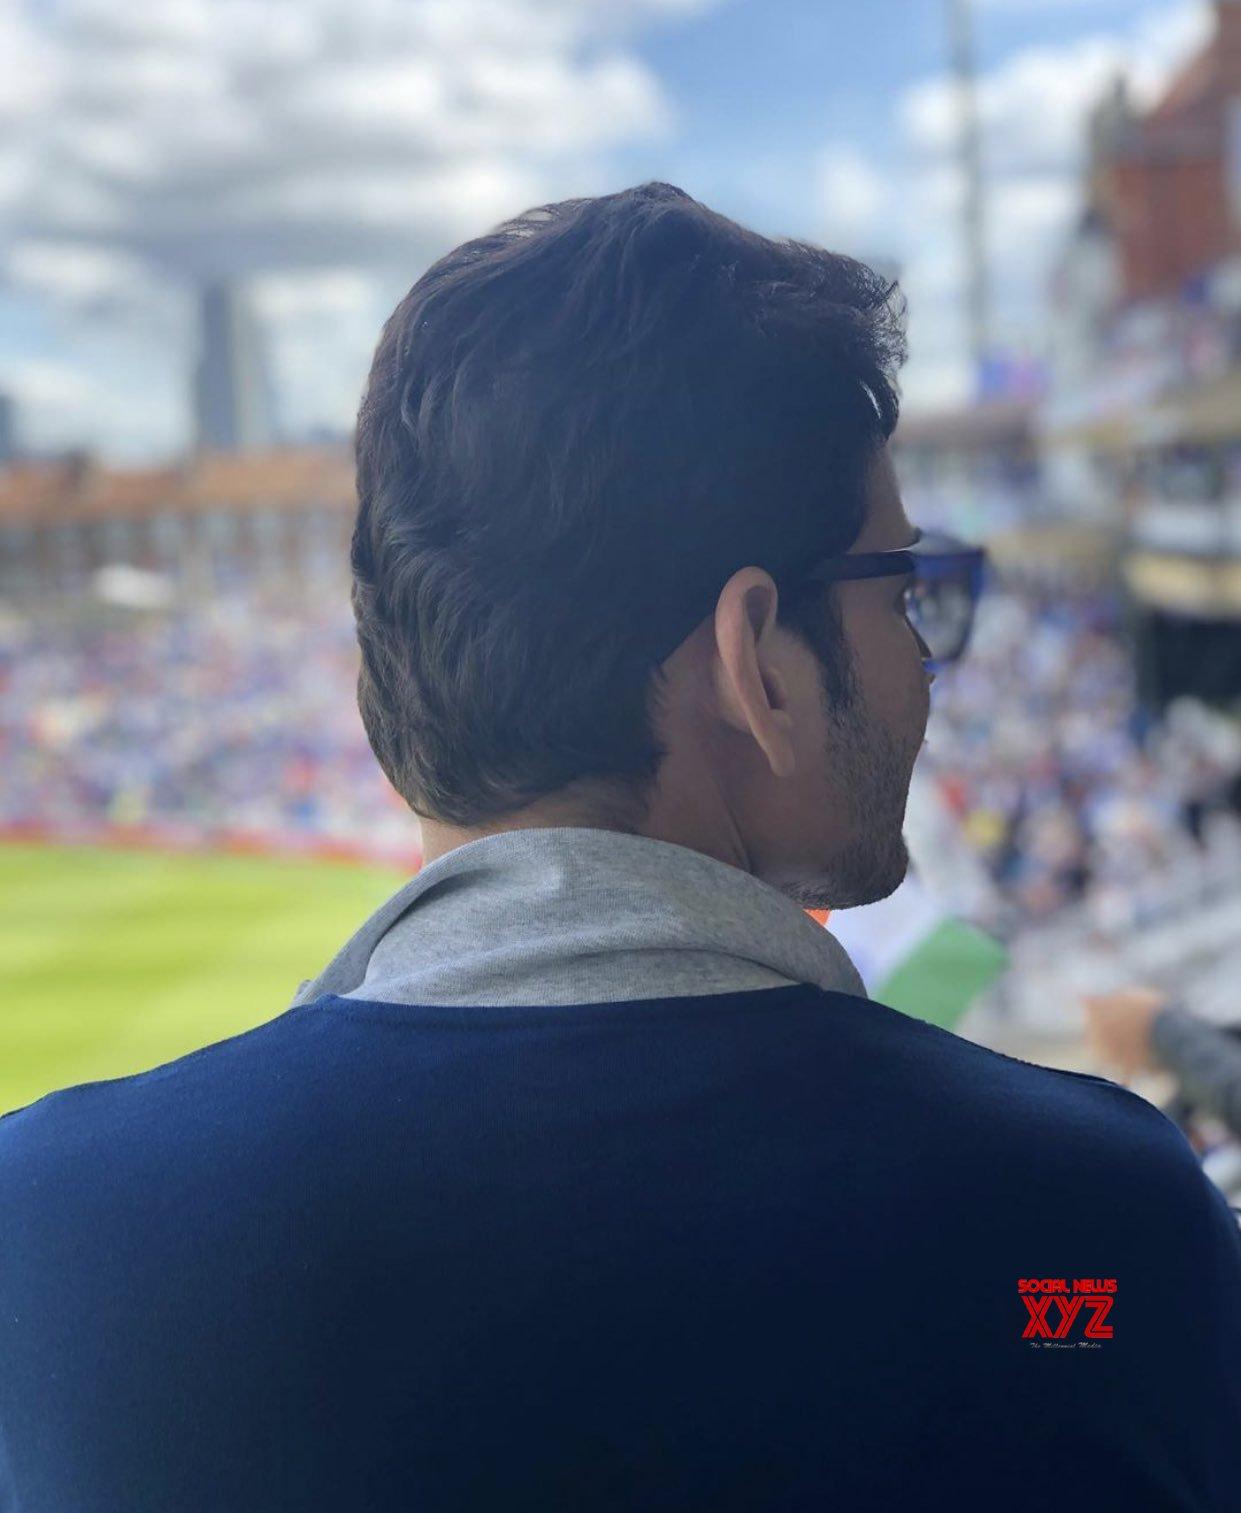 Mahesh Babu Stylish Still From Cricket World Cup